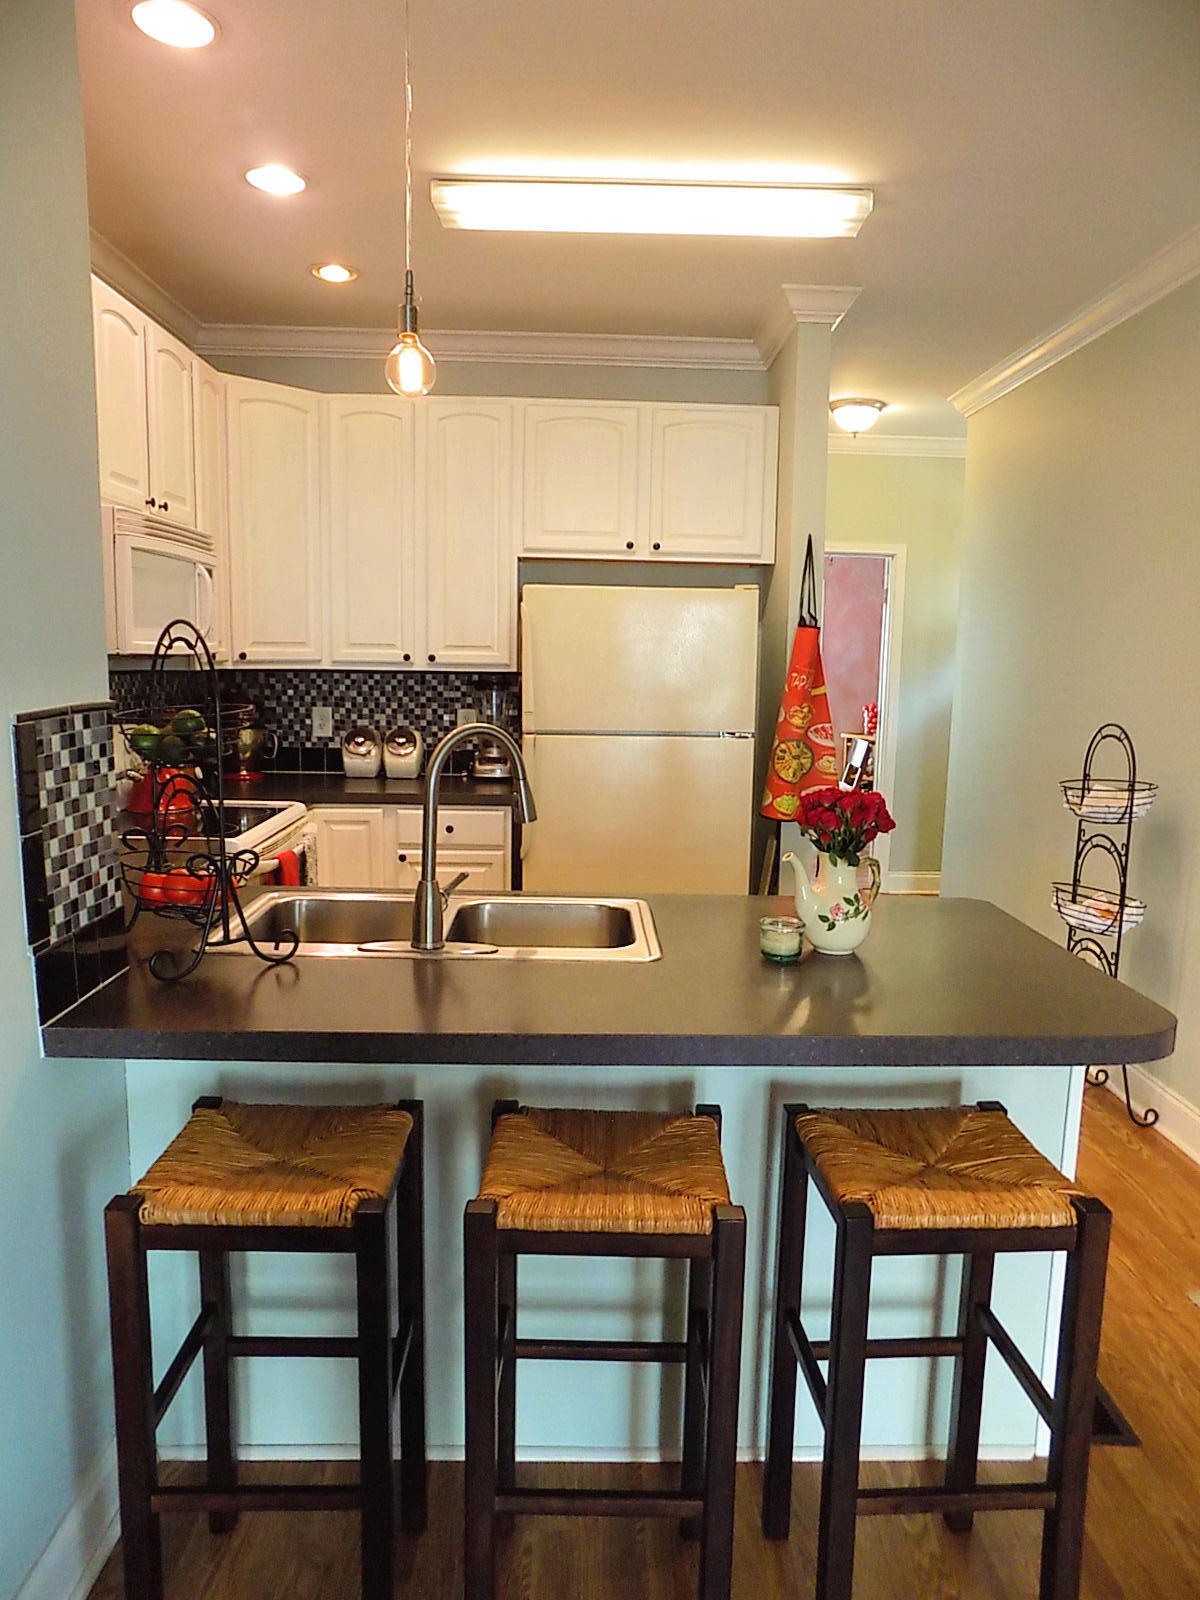 Willow Oaks Homes For Sale - 1829 Dogwood, Charleston, SC - 20